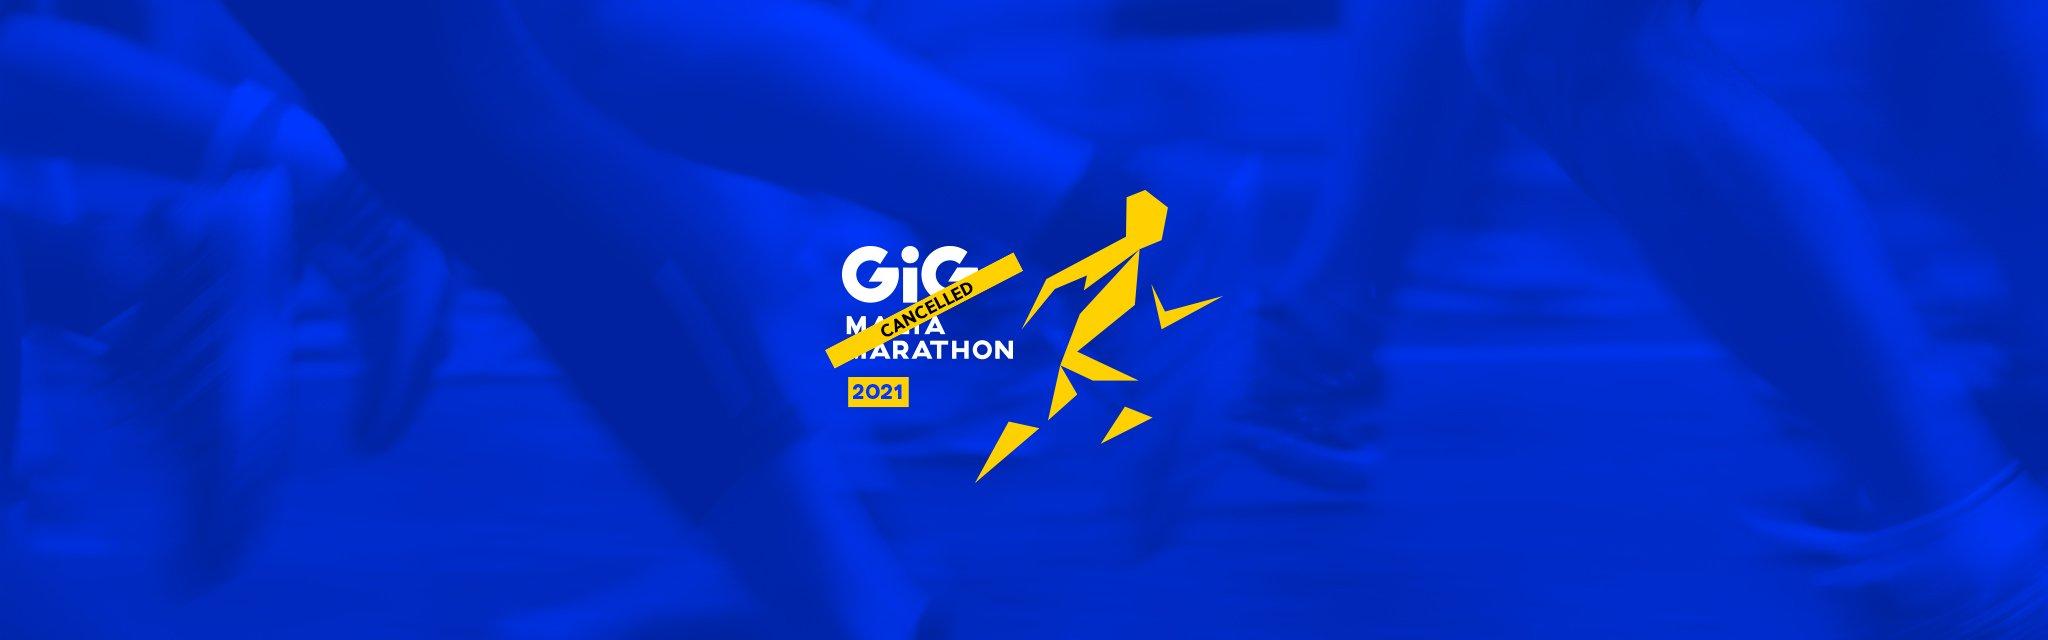 GiG Malta Marathon